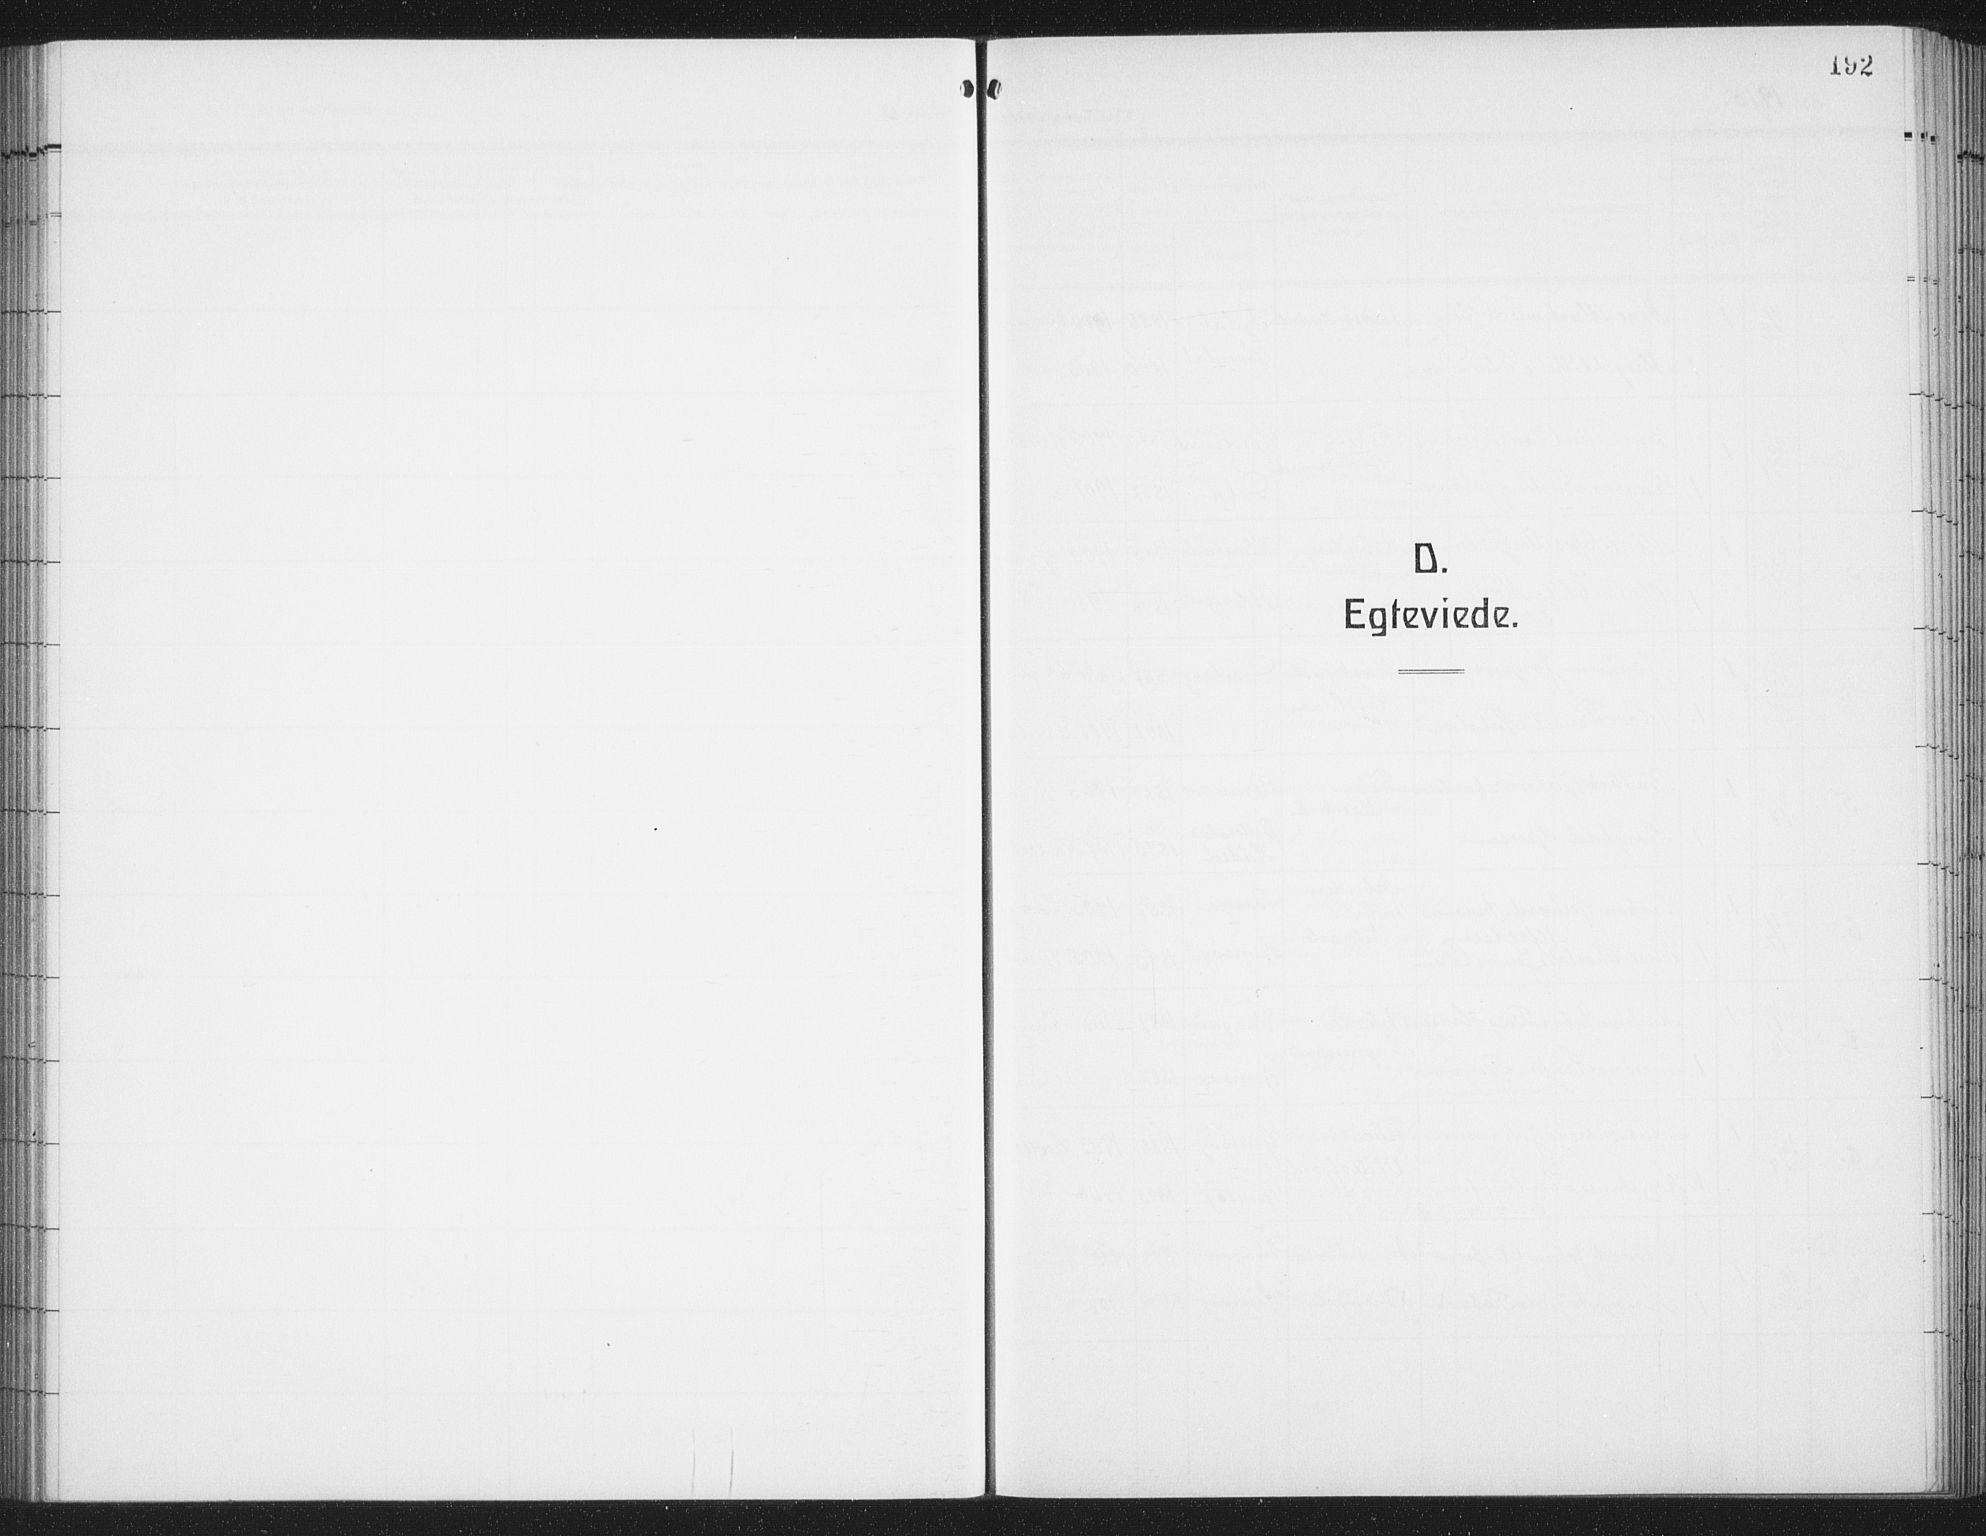 SAT, Ministerialprotokoller, klokkerbøker og fødselsregistre - Nordland, 876/L1106: Klokkerbok nr. 876C05, 1915-1942, s. 192